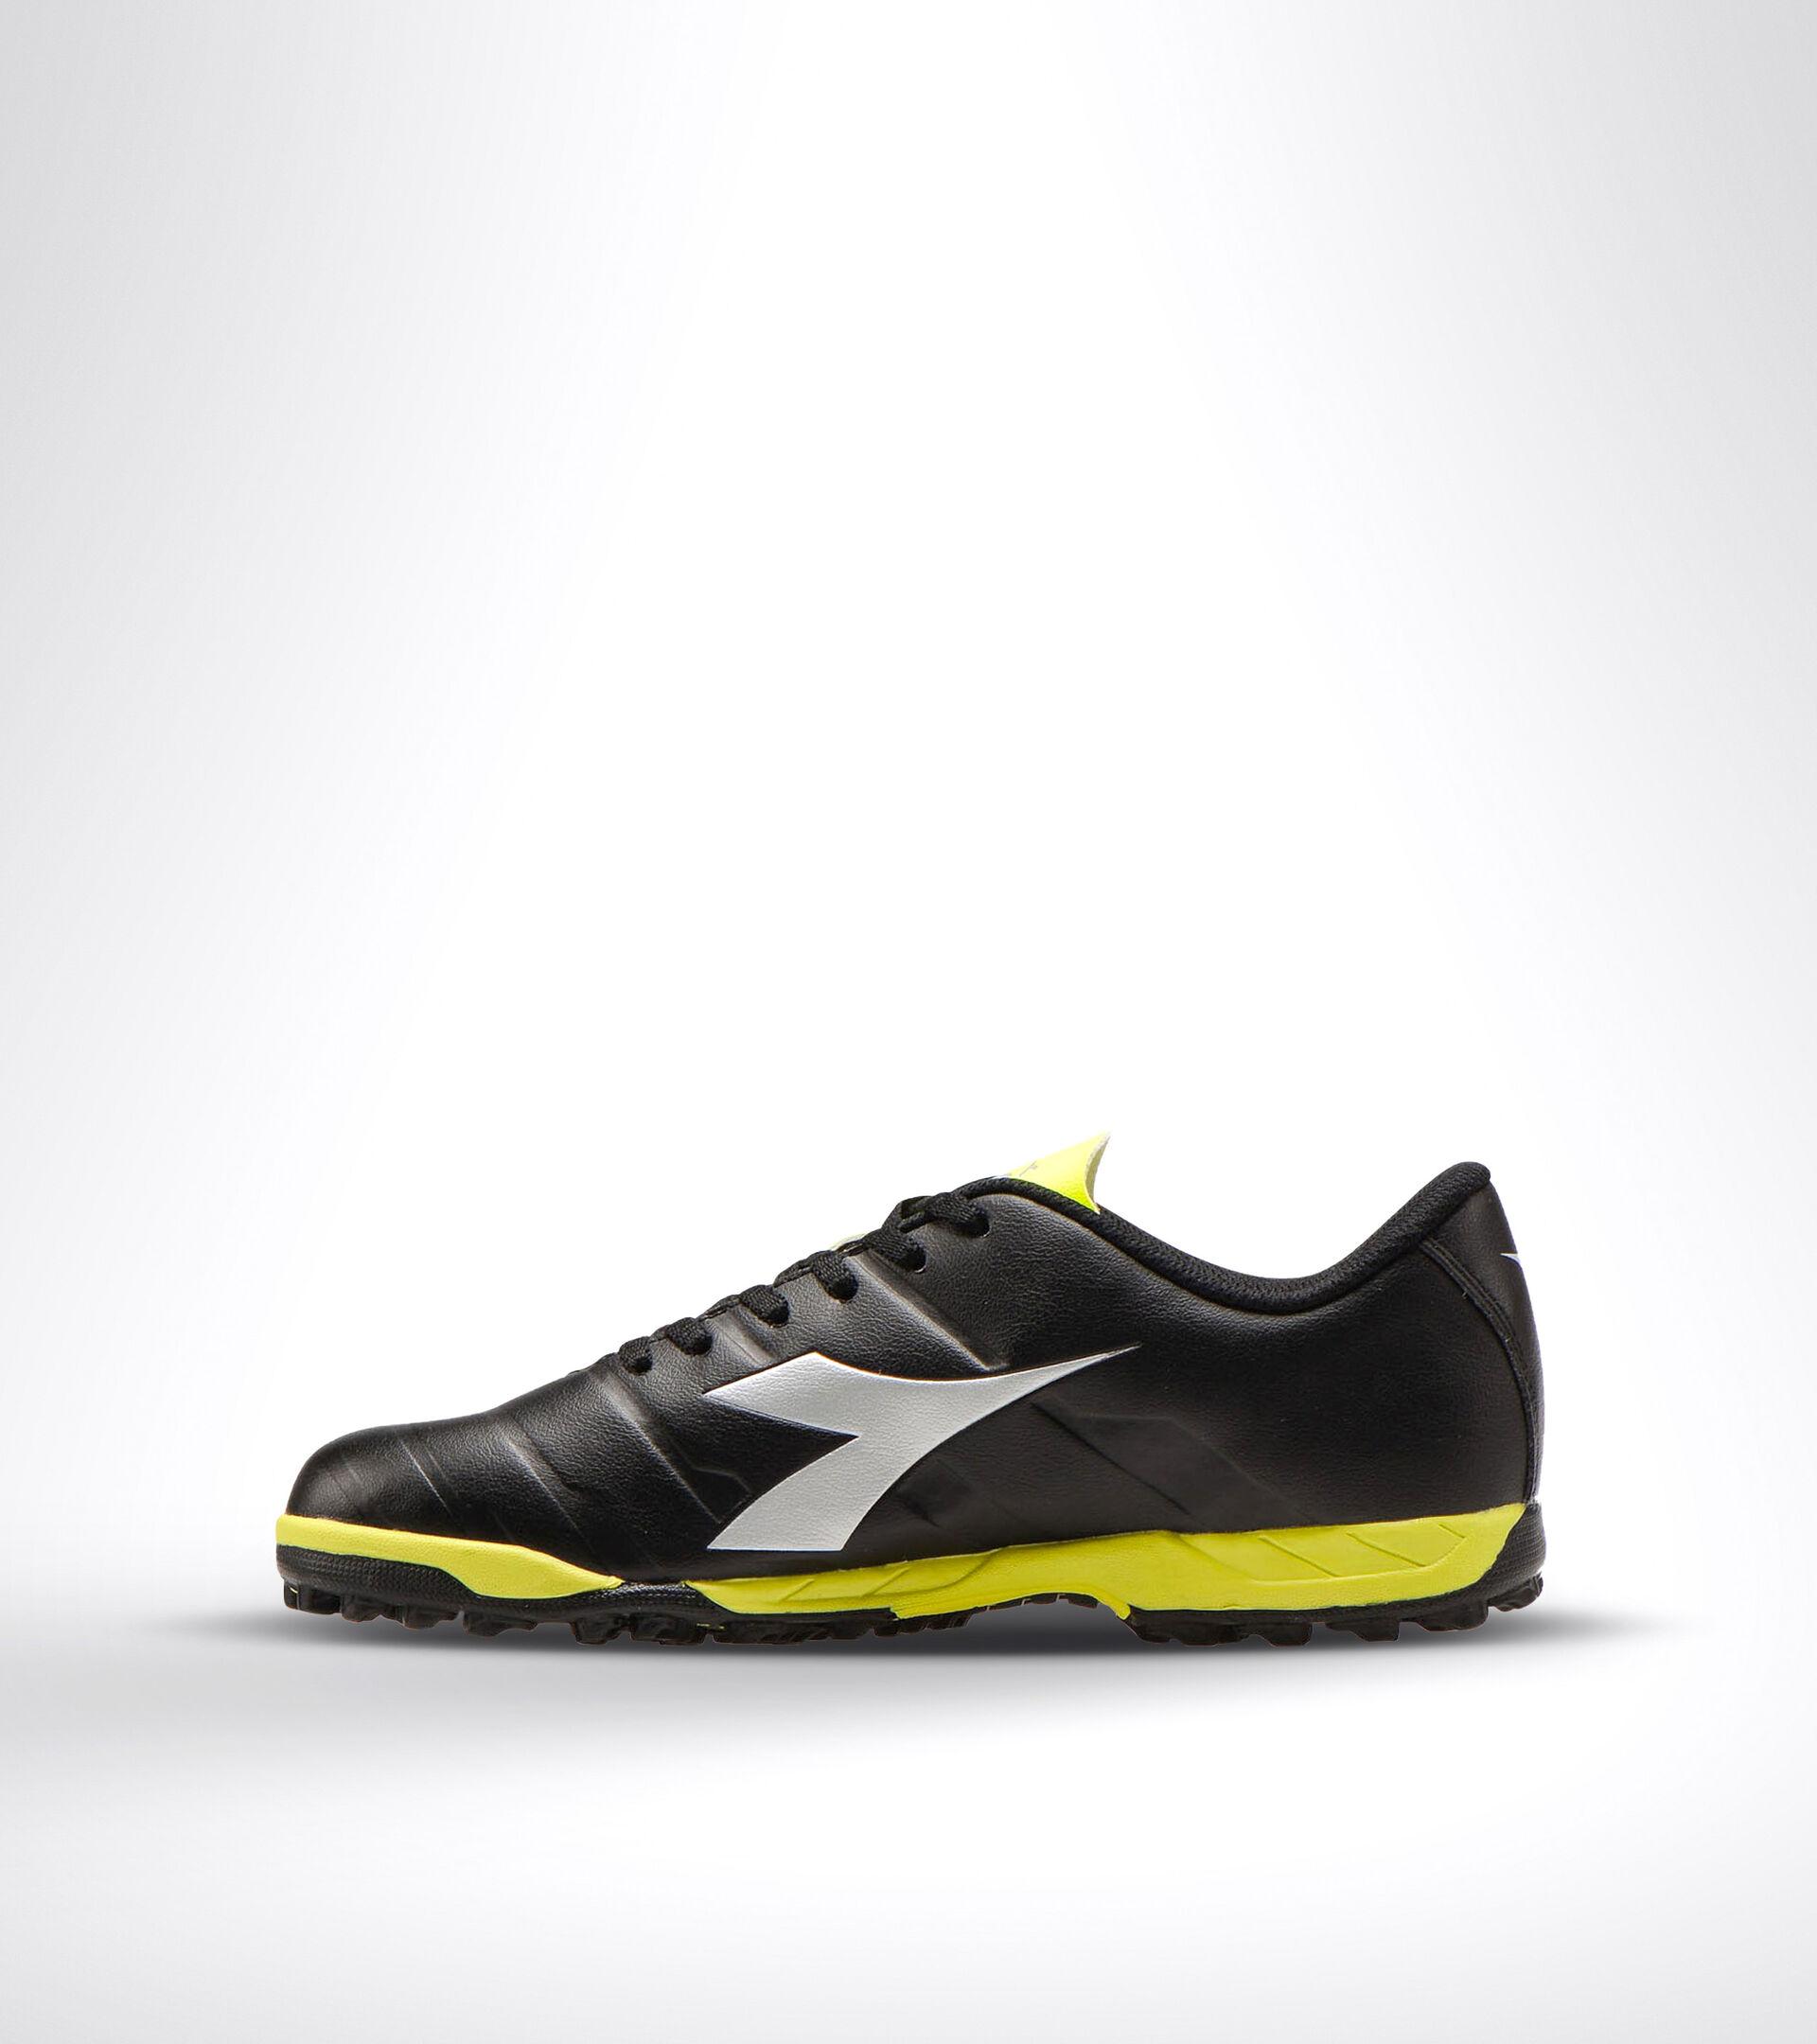 Footwear Sport UOMO PICHICHI 3 TF NERO/GIALLO FL DD/ARGENTO Diadora